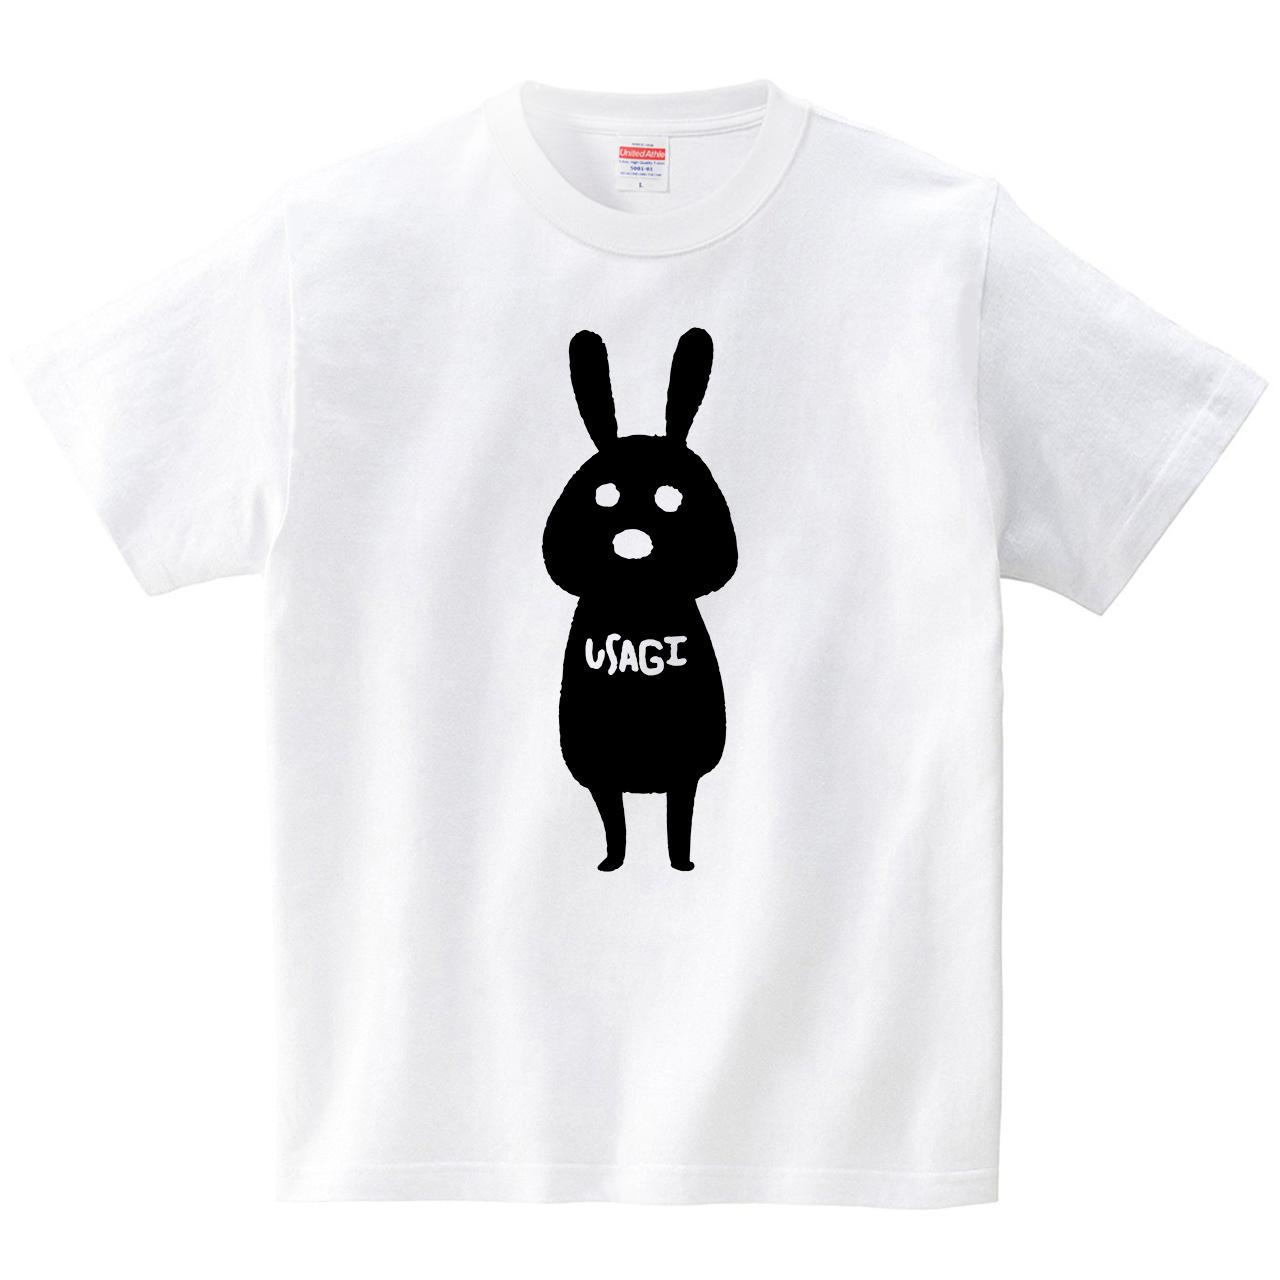 BLACK USAGI(Tシャツ・ホワイト)(ぶひめ)